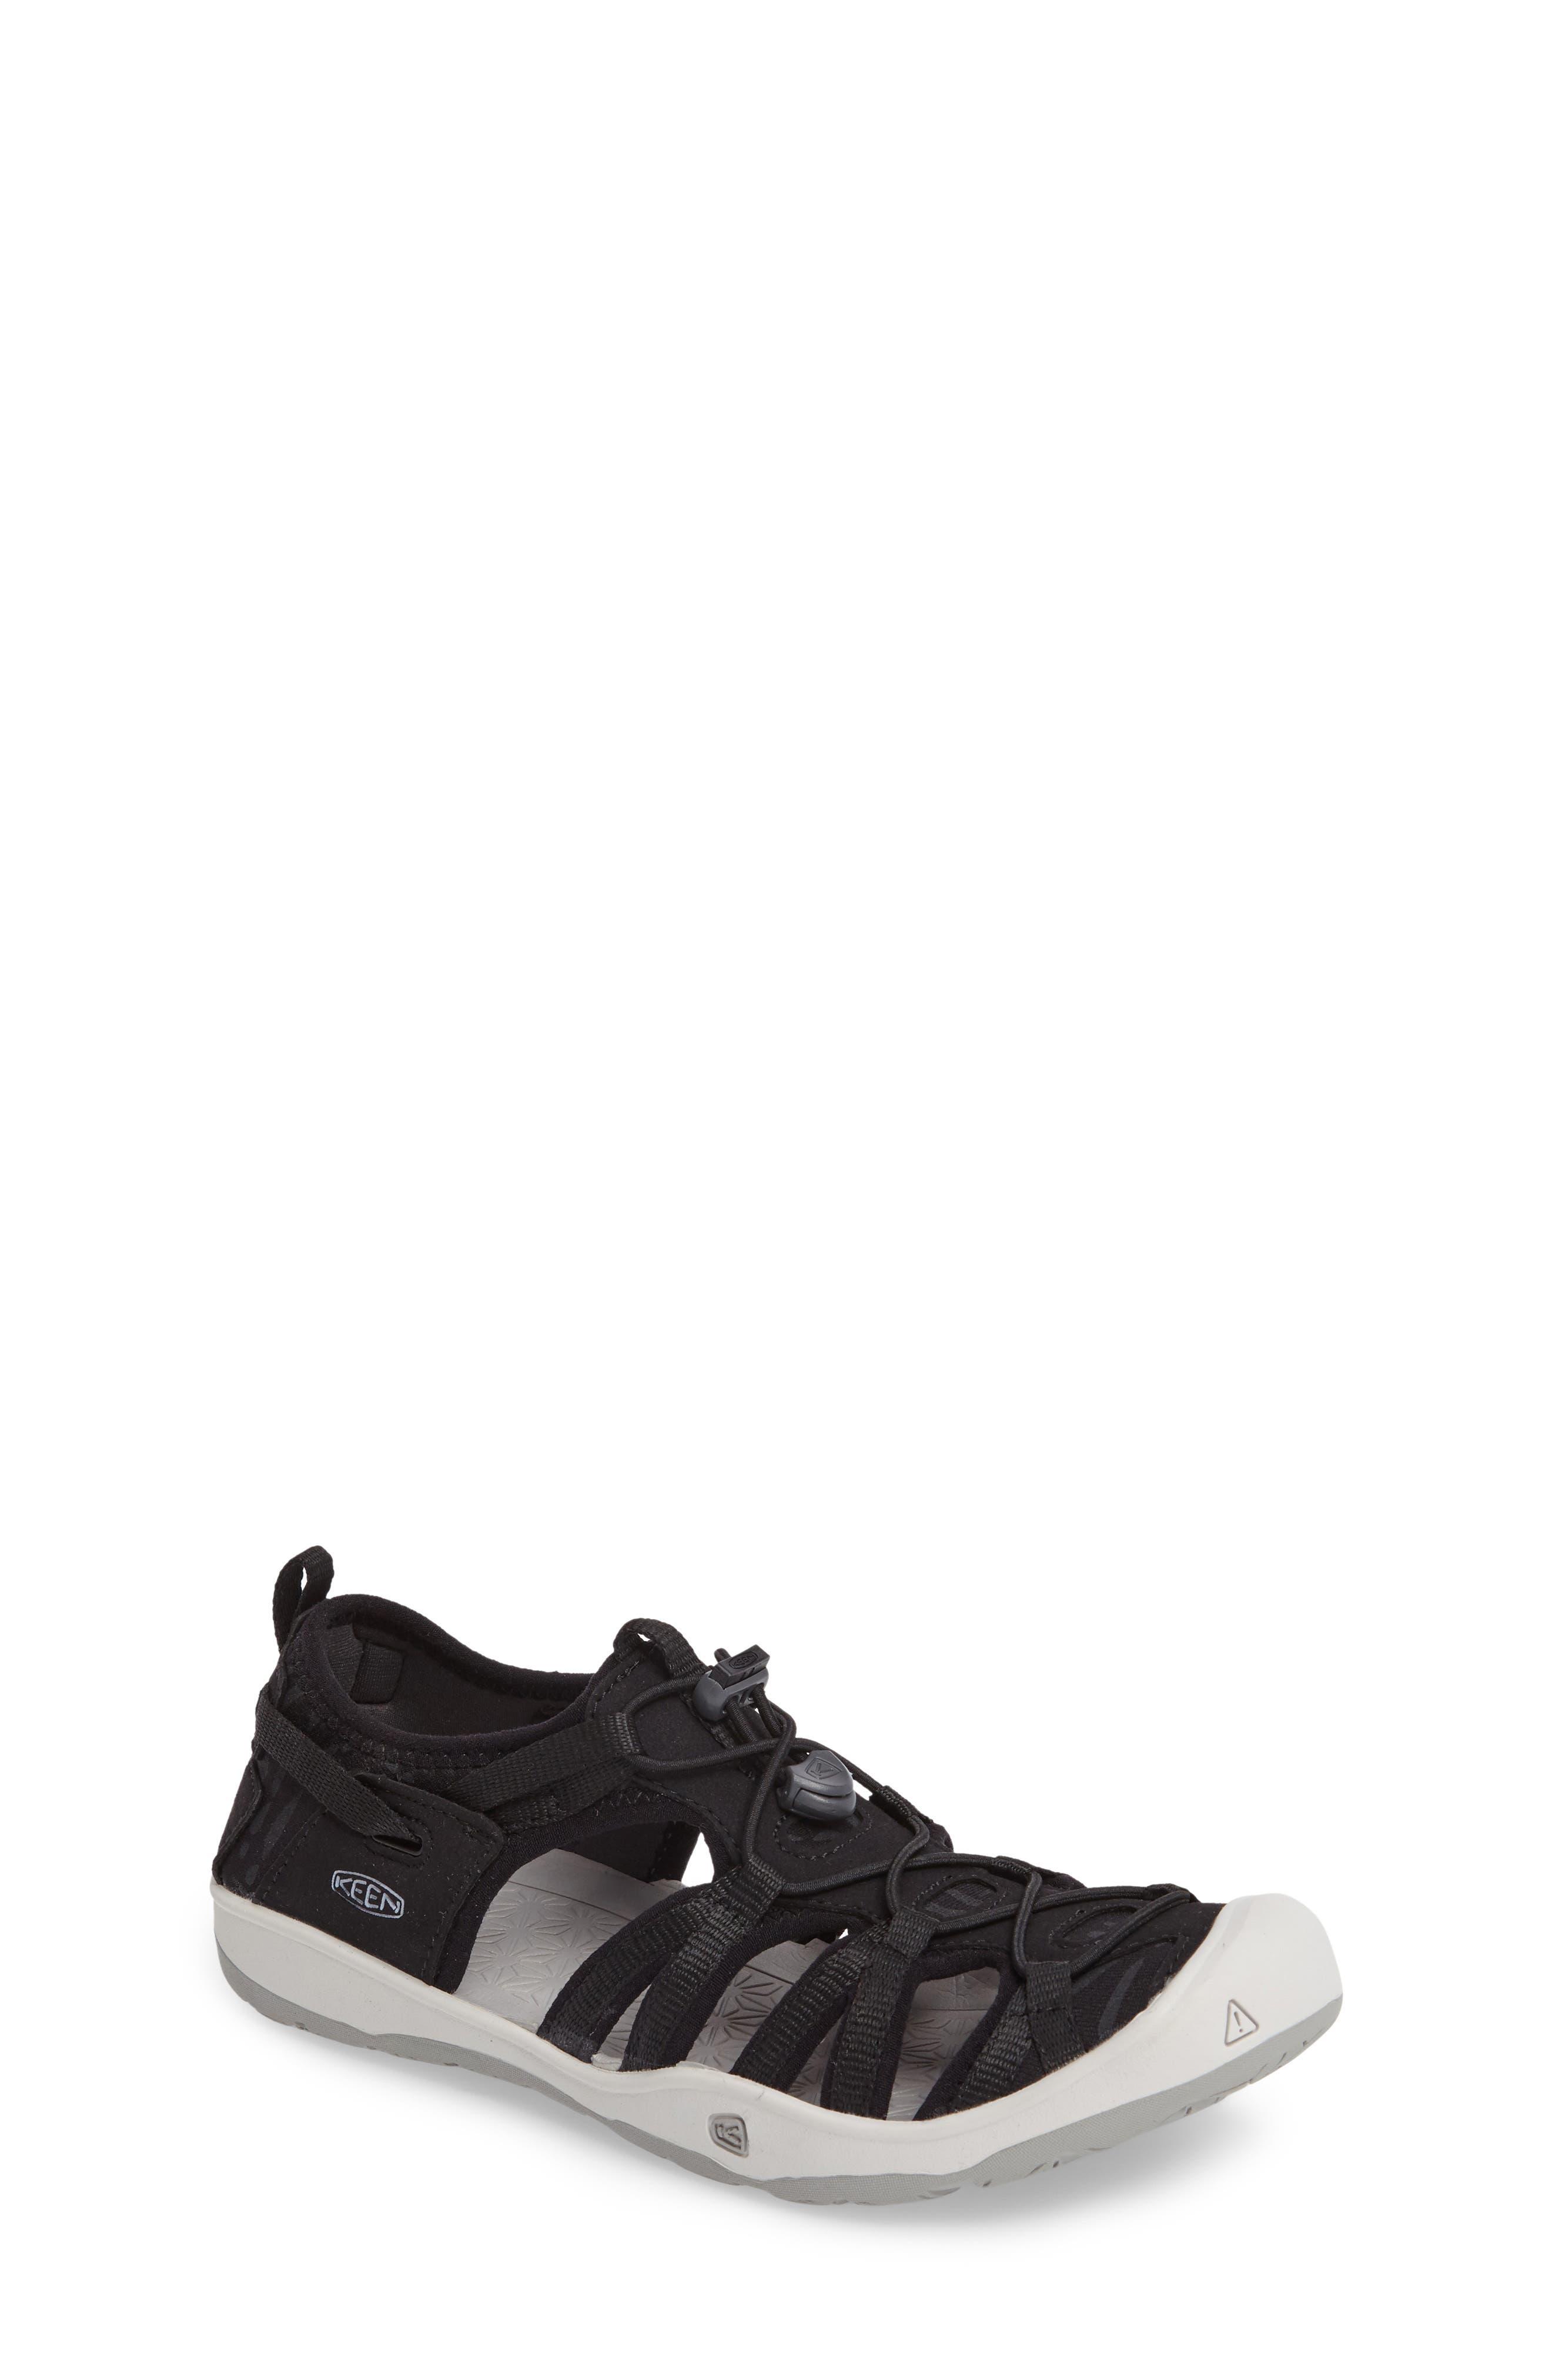 KEEN Moxie Water Friendly Sandal, Main, color, BLACK/ VAPOR